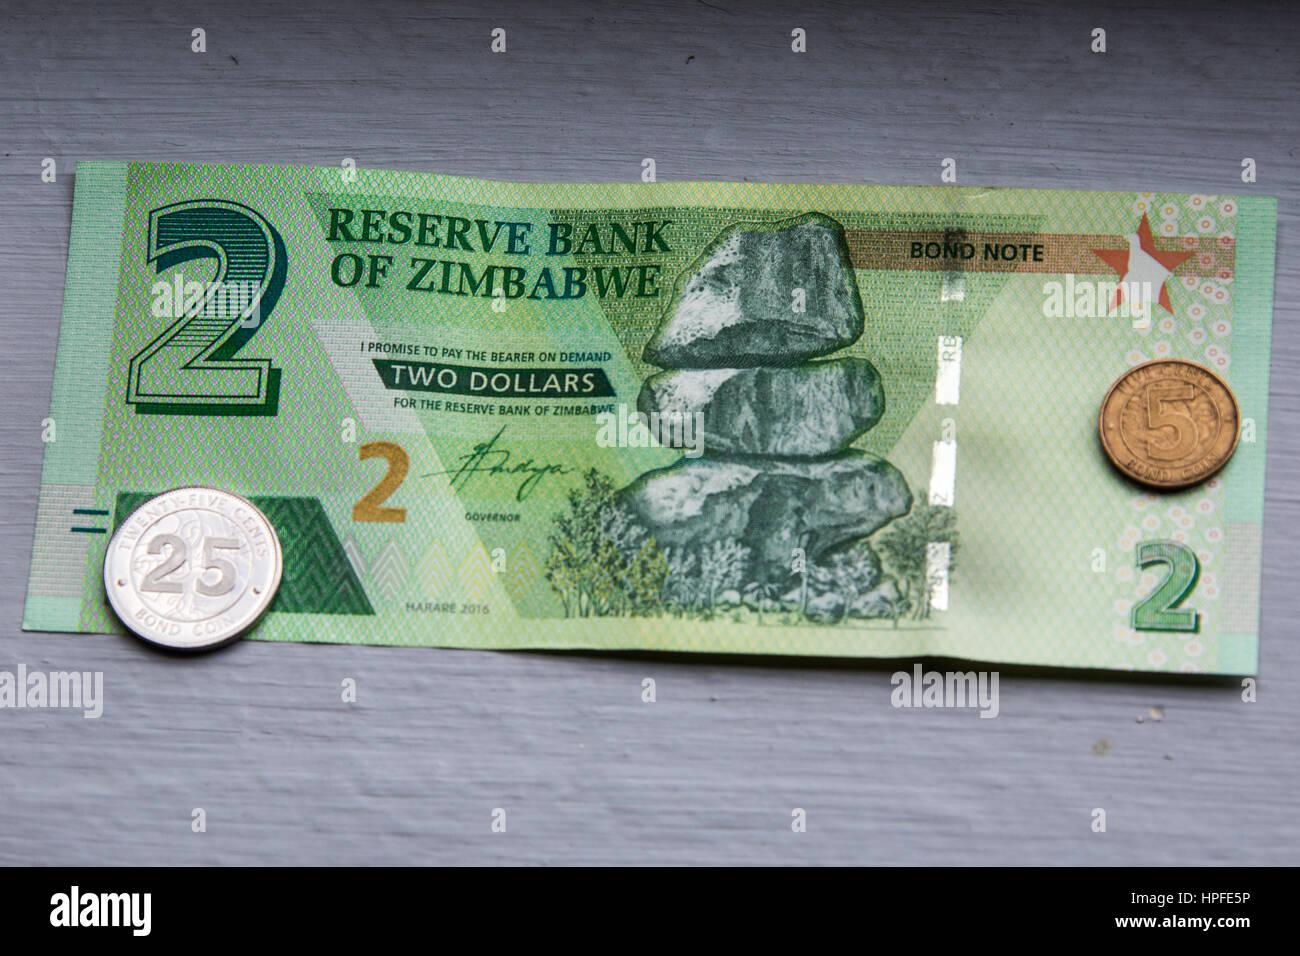 Deux dollar bond remarque, au Zimbabwe Photo Stock